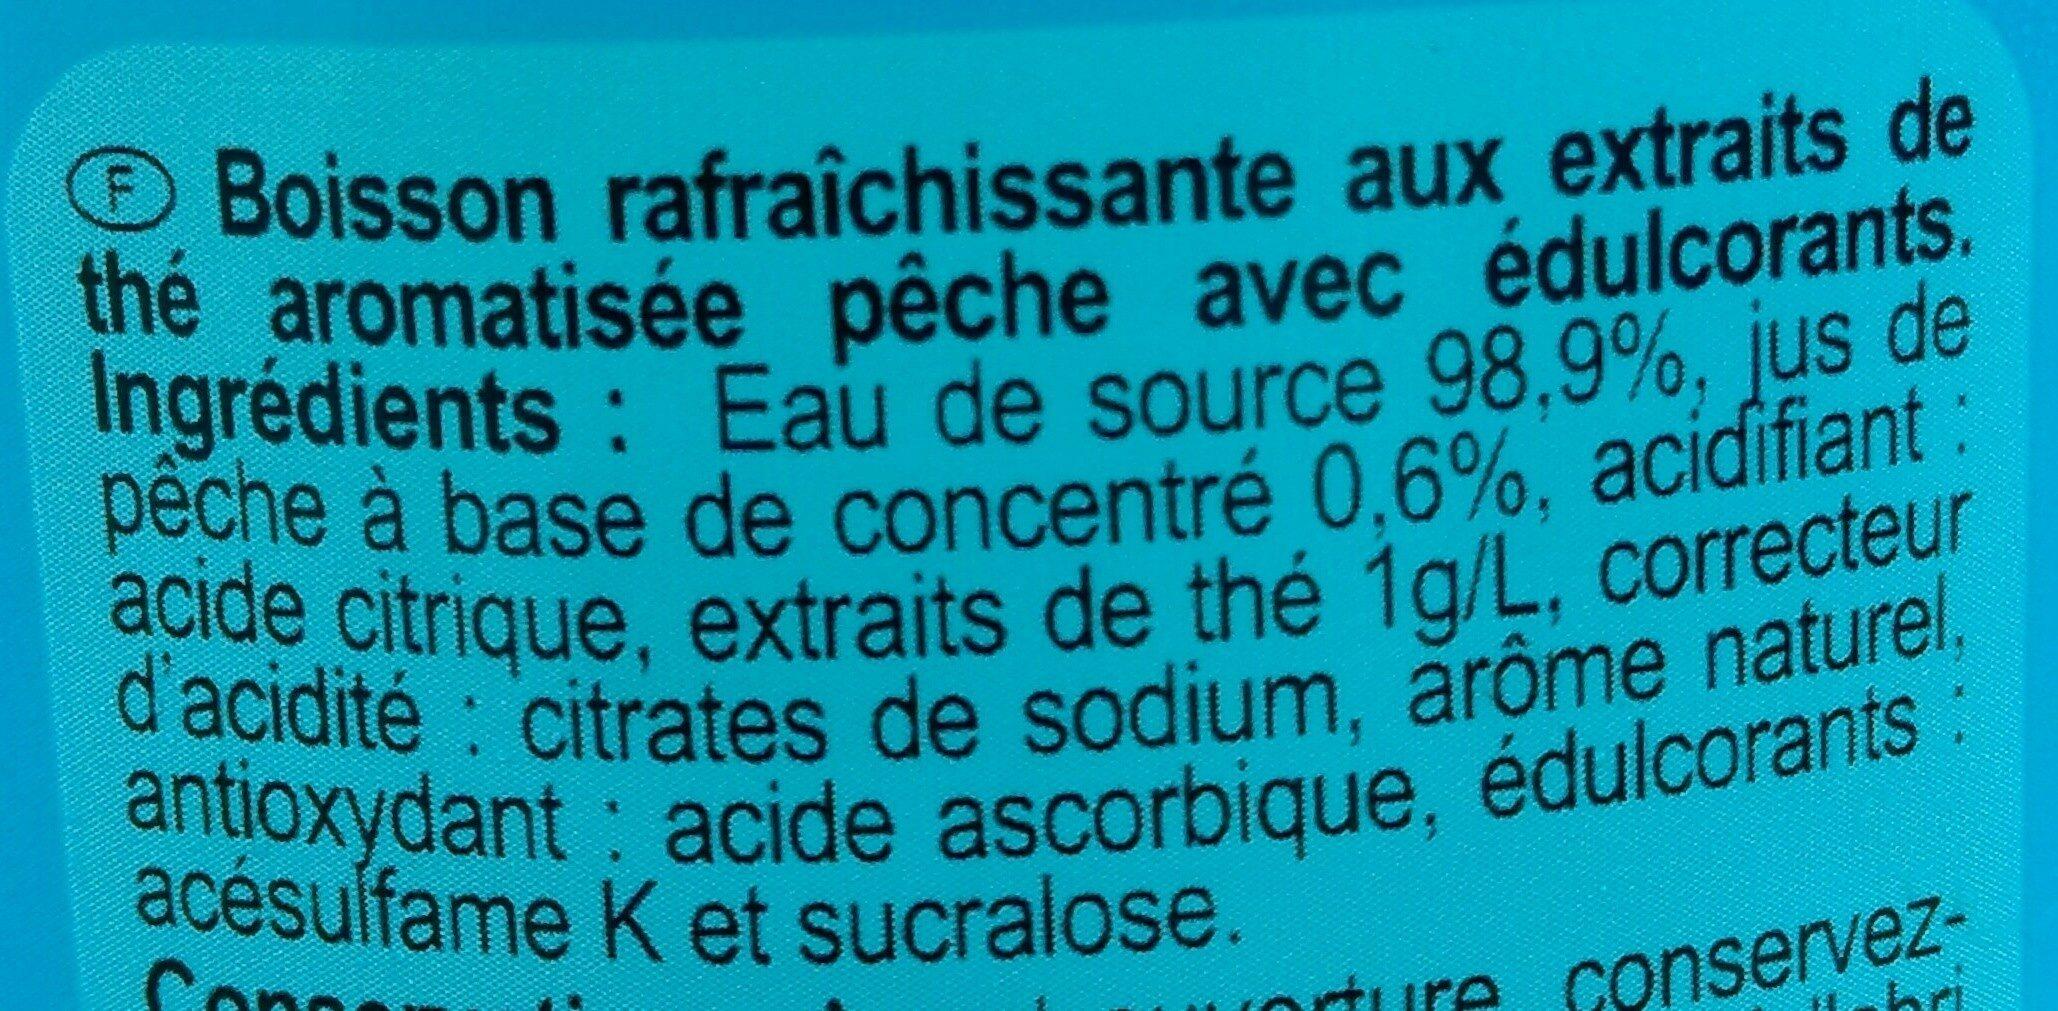 Iced Tea zéro saveur pêche - Ingredients - fr